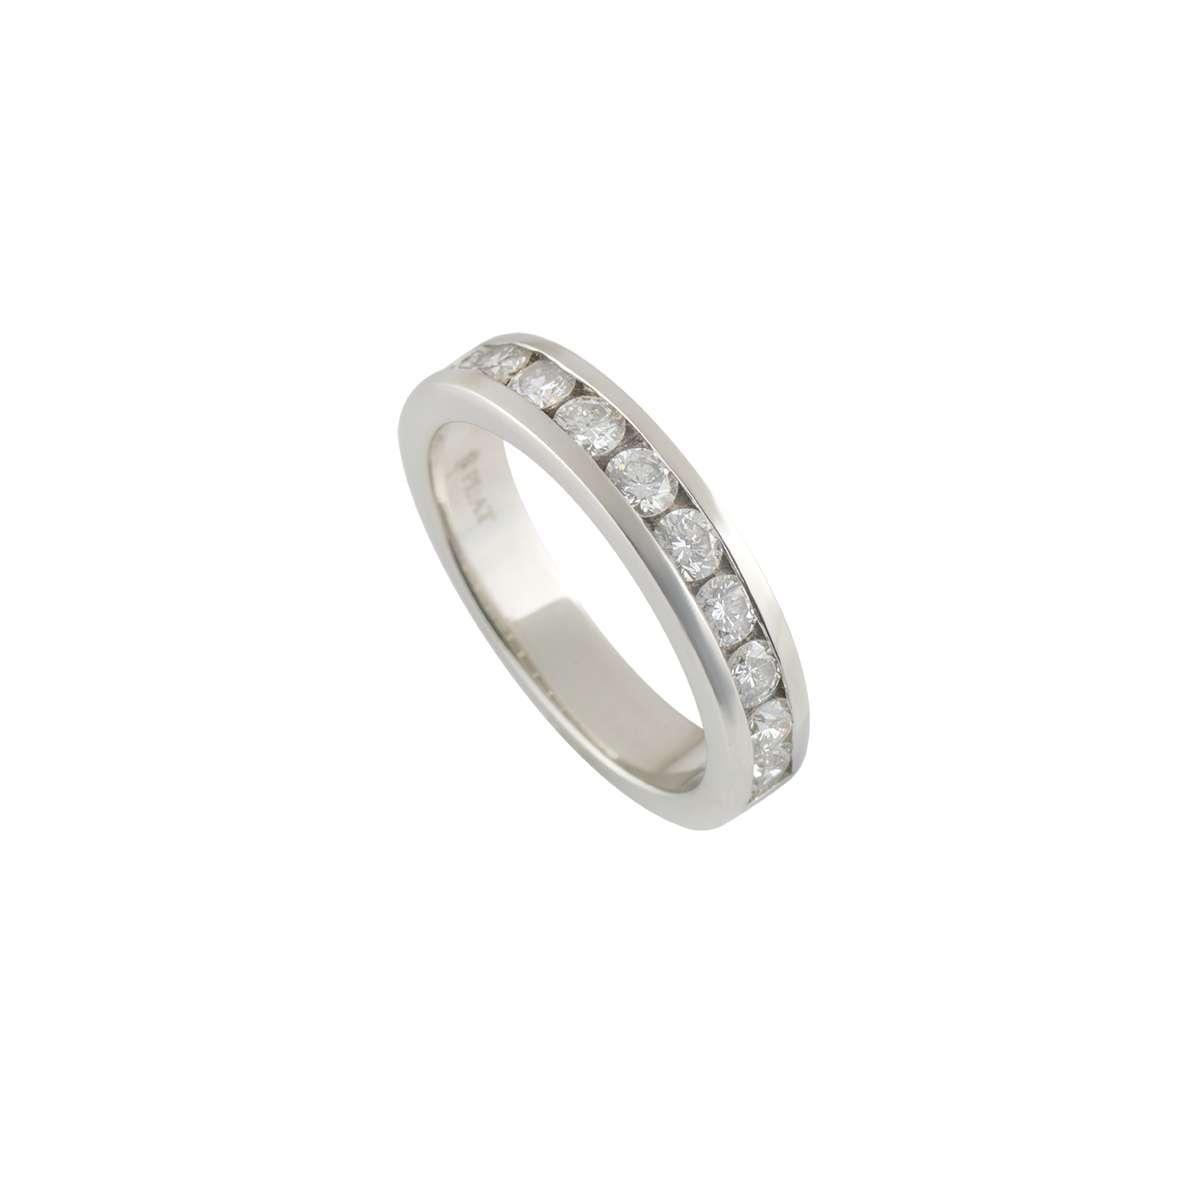 Half Eternity Diamond Ring in Platinum 0.77ct G/VS